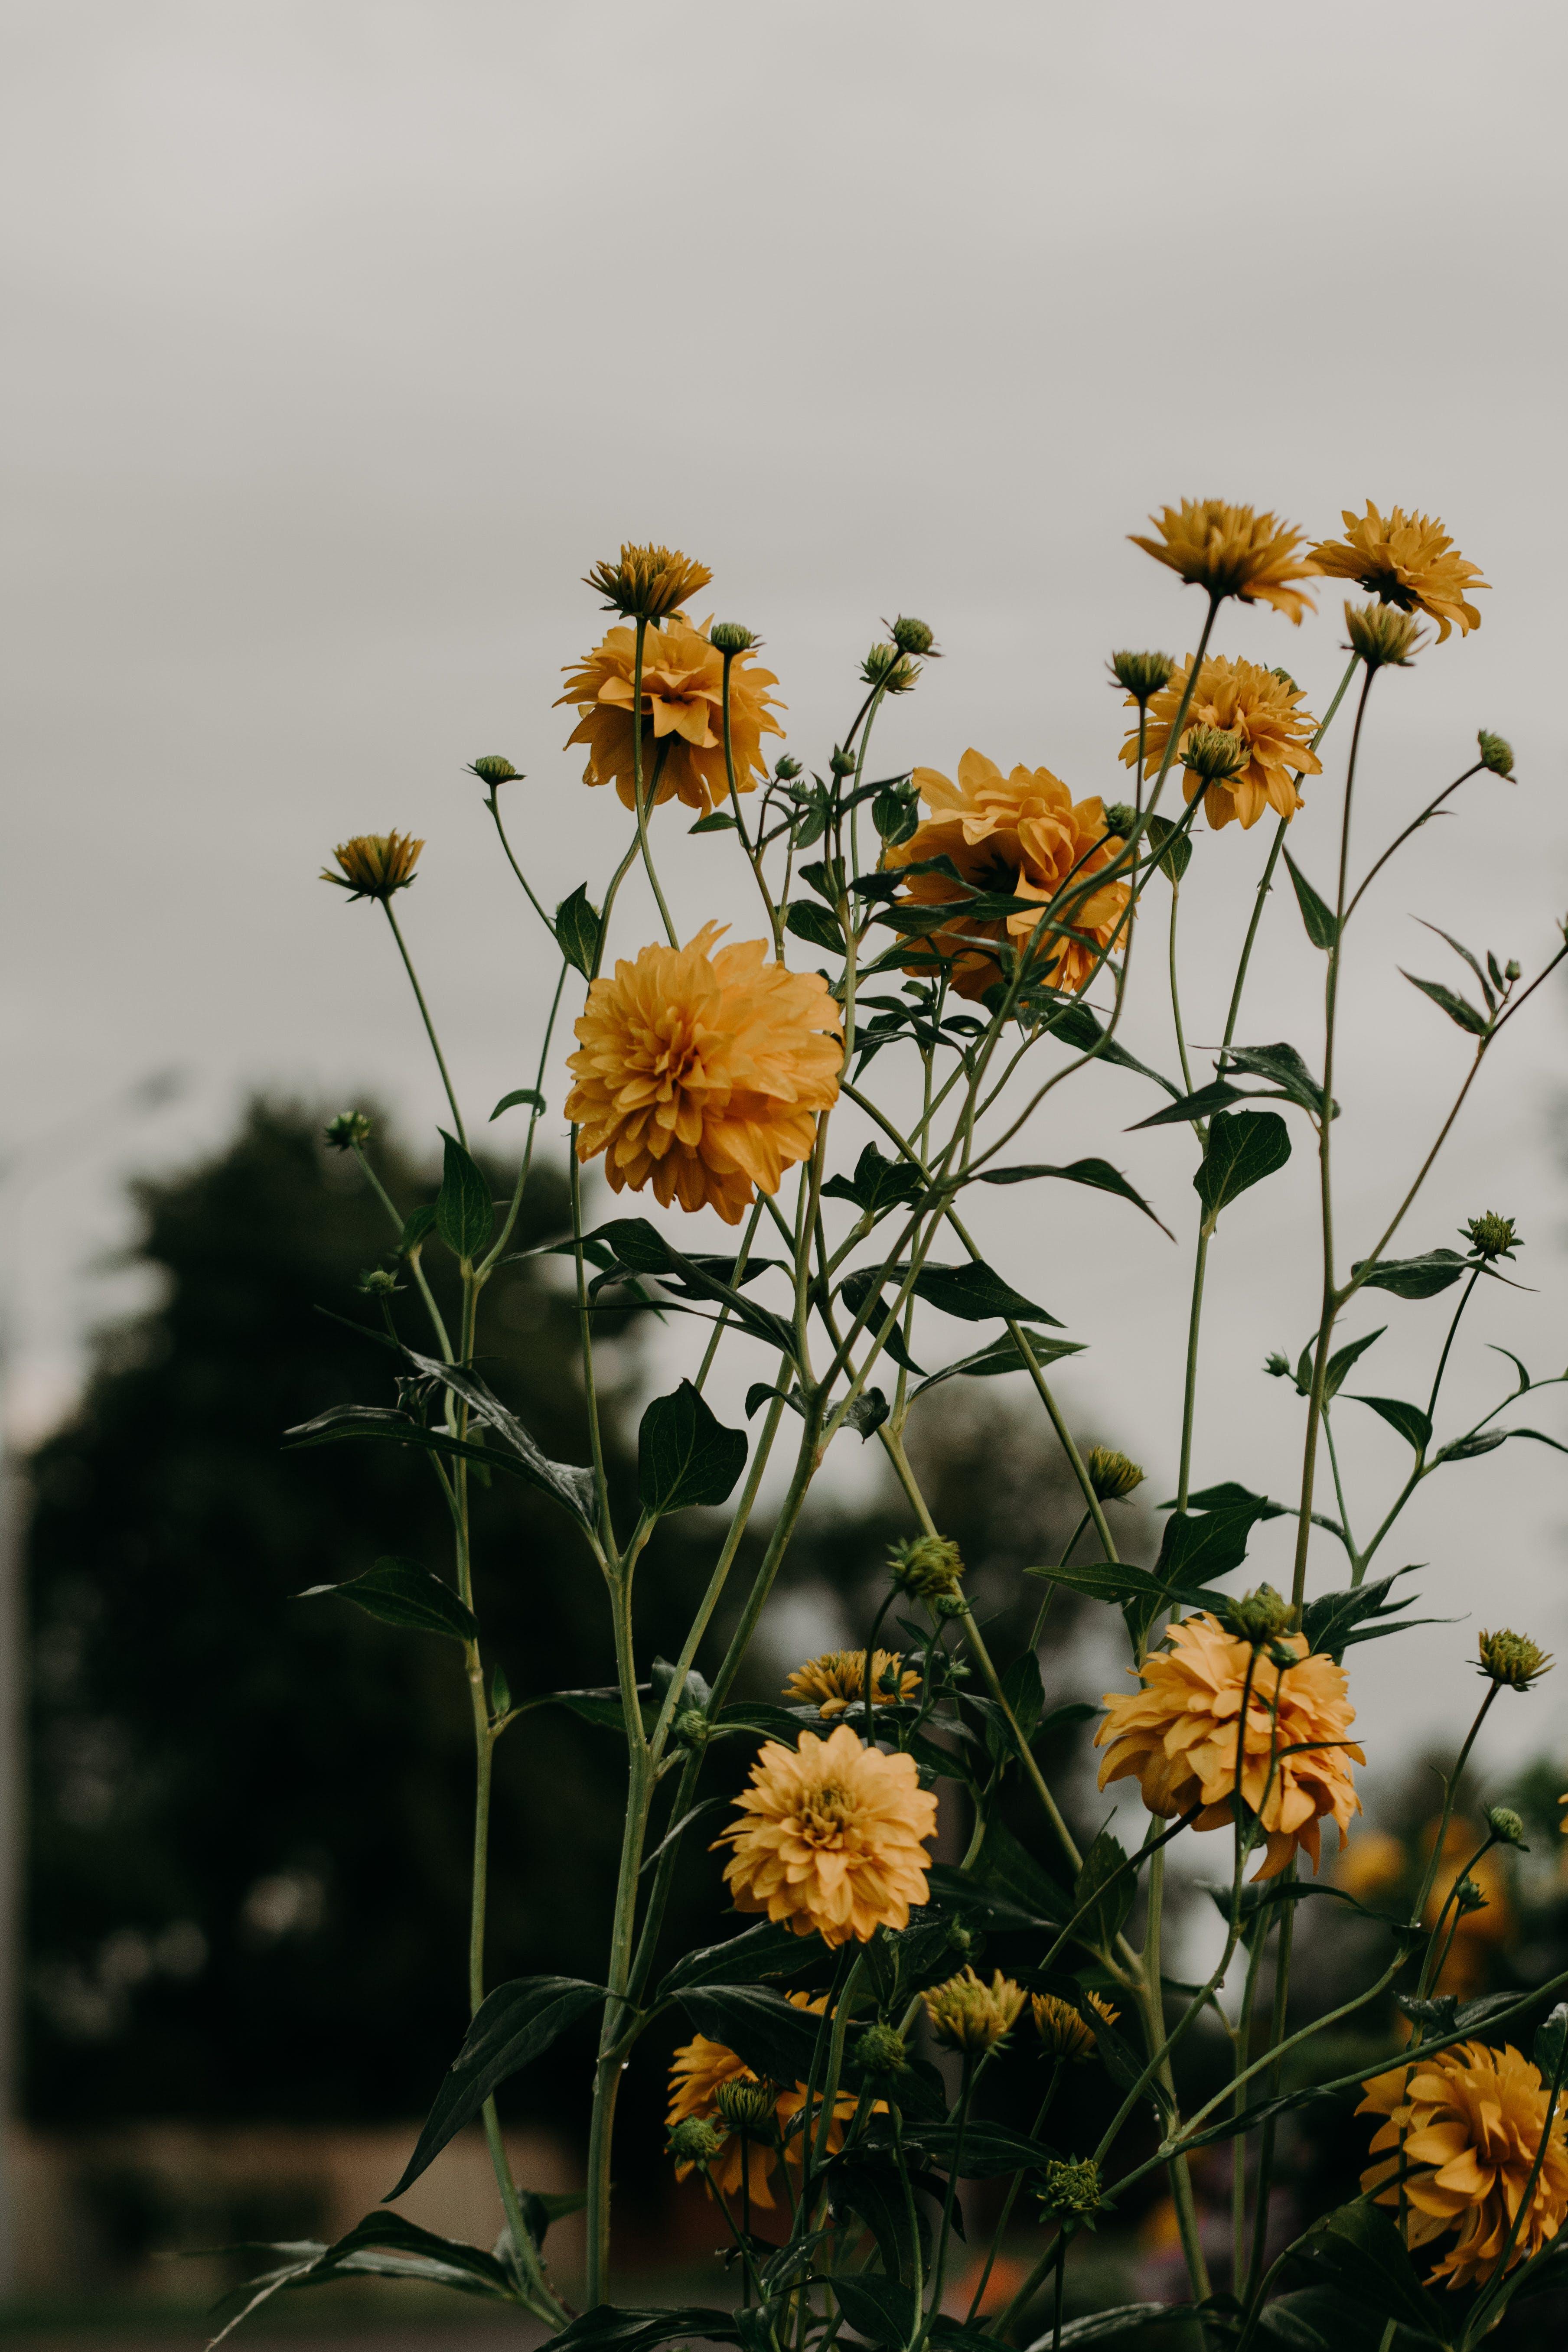 Selective Focus Photo of Yellow Dahlia Flowers